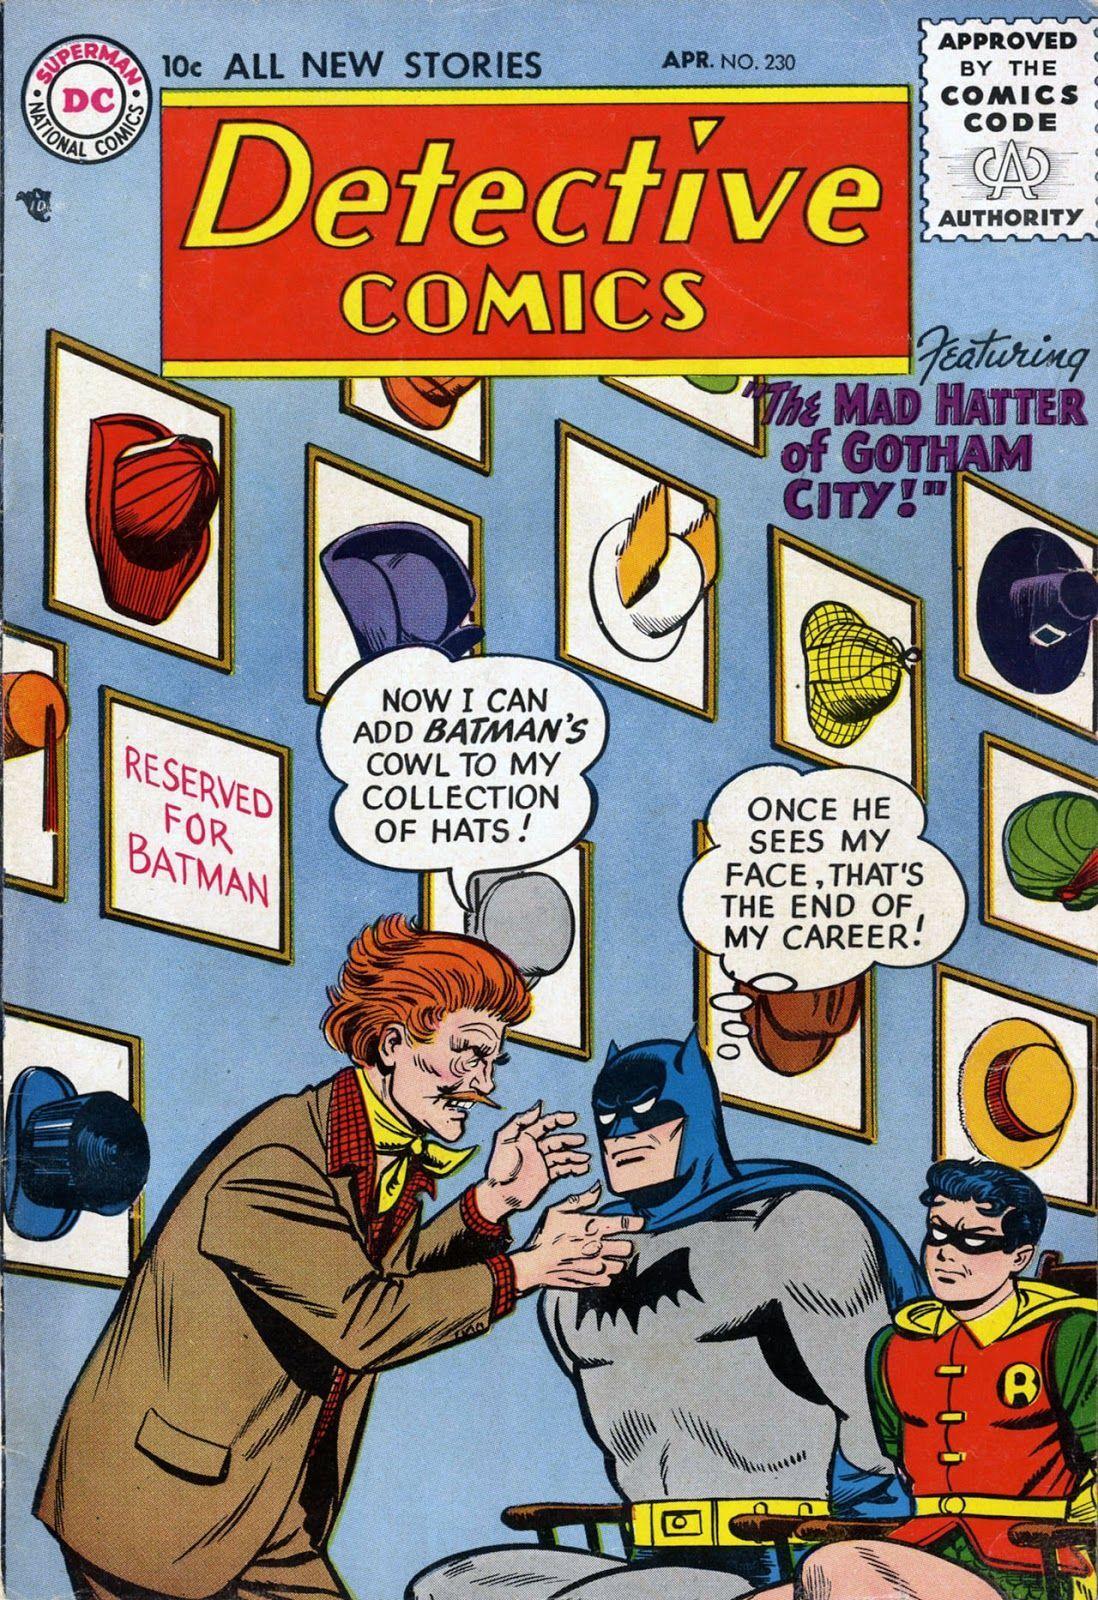 Detective Comics #230 (Writer: Bill Finger, Penciler: Sheldon Moldoff)